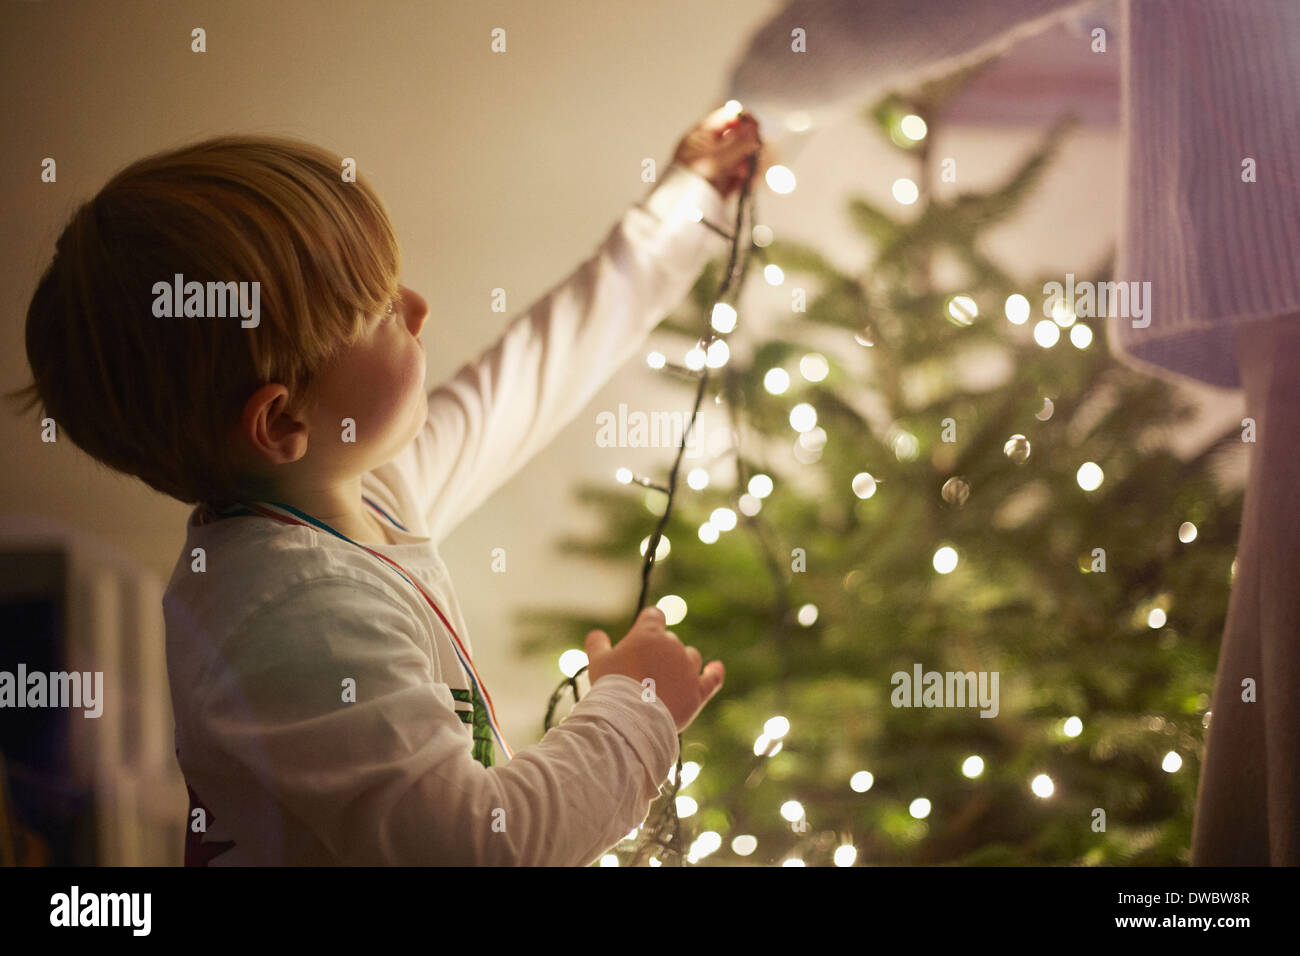 Young boy putting up christmas tree lights - Stock Image